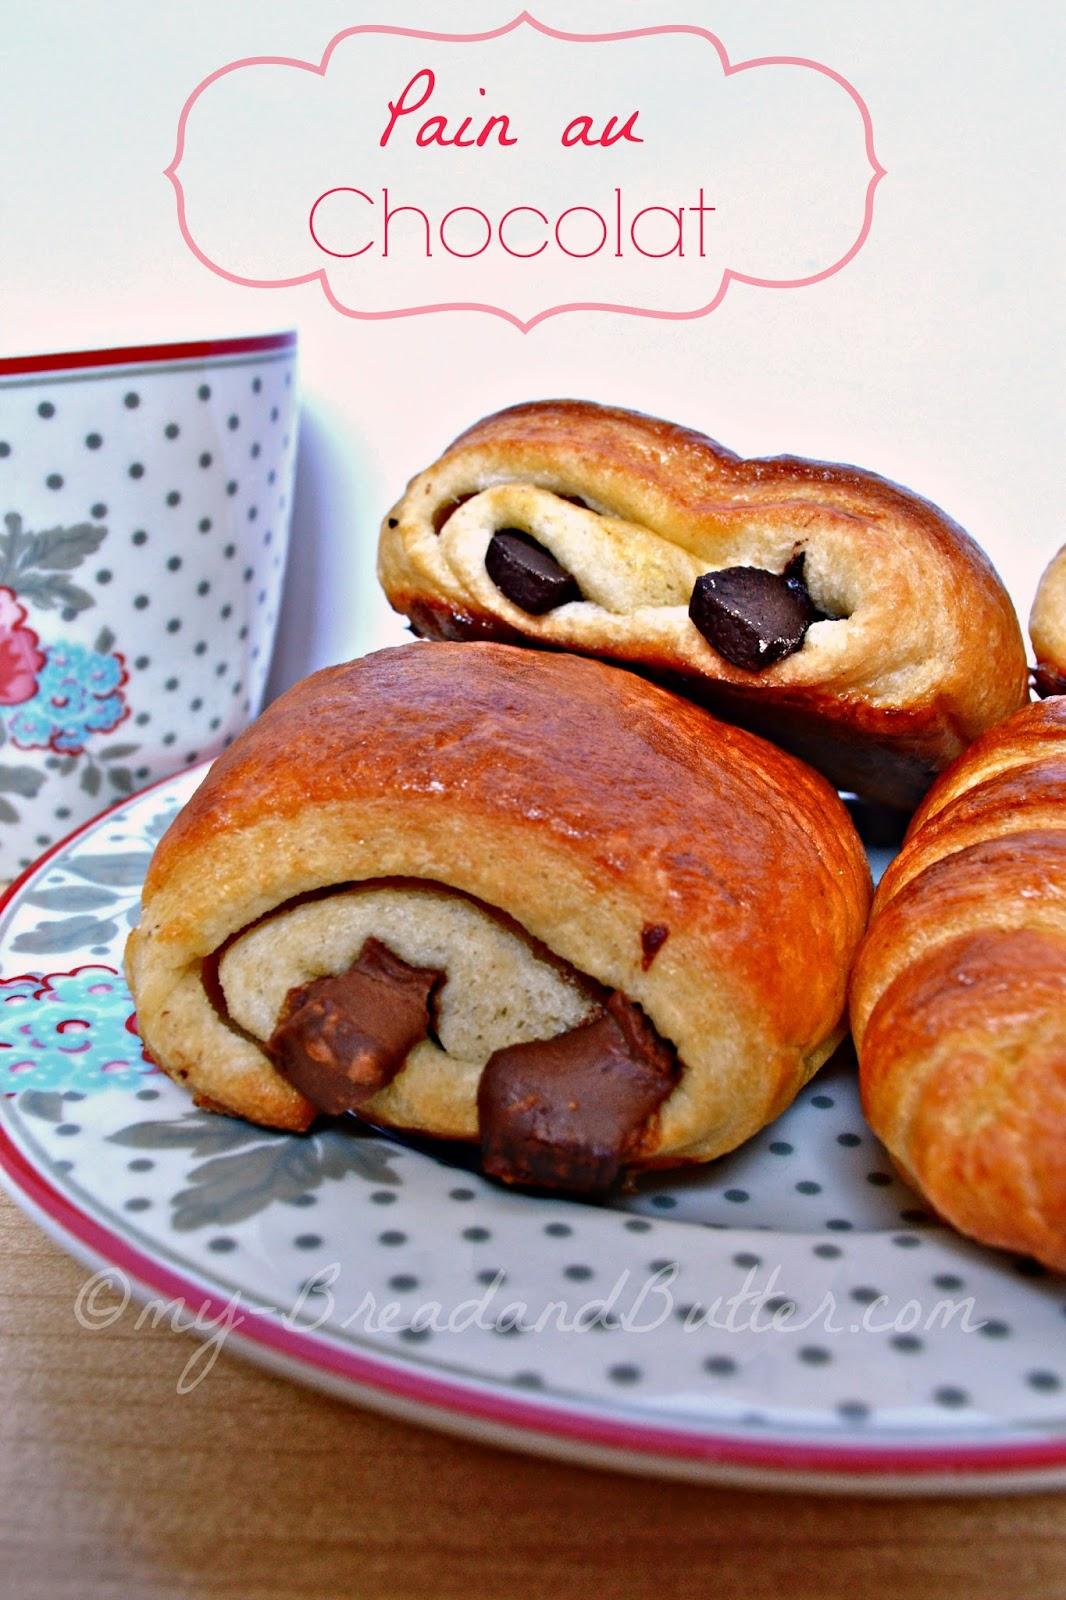 bread and butter ricette facili e gustose pain au chocolat e croissants francesi. Black Bedroom Furniture Sets. Home Design Ideas